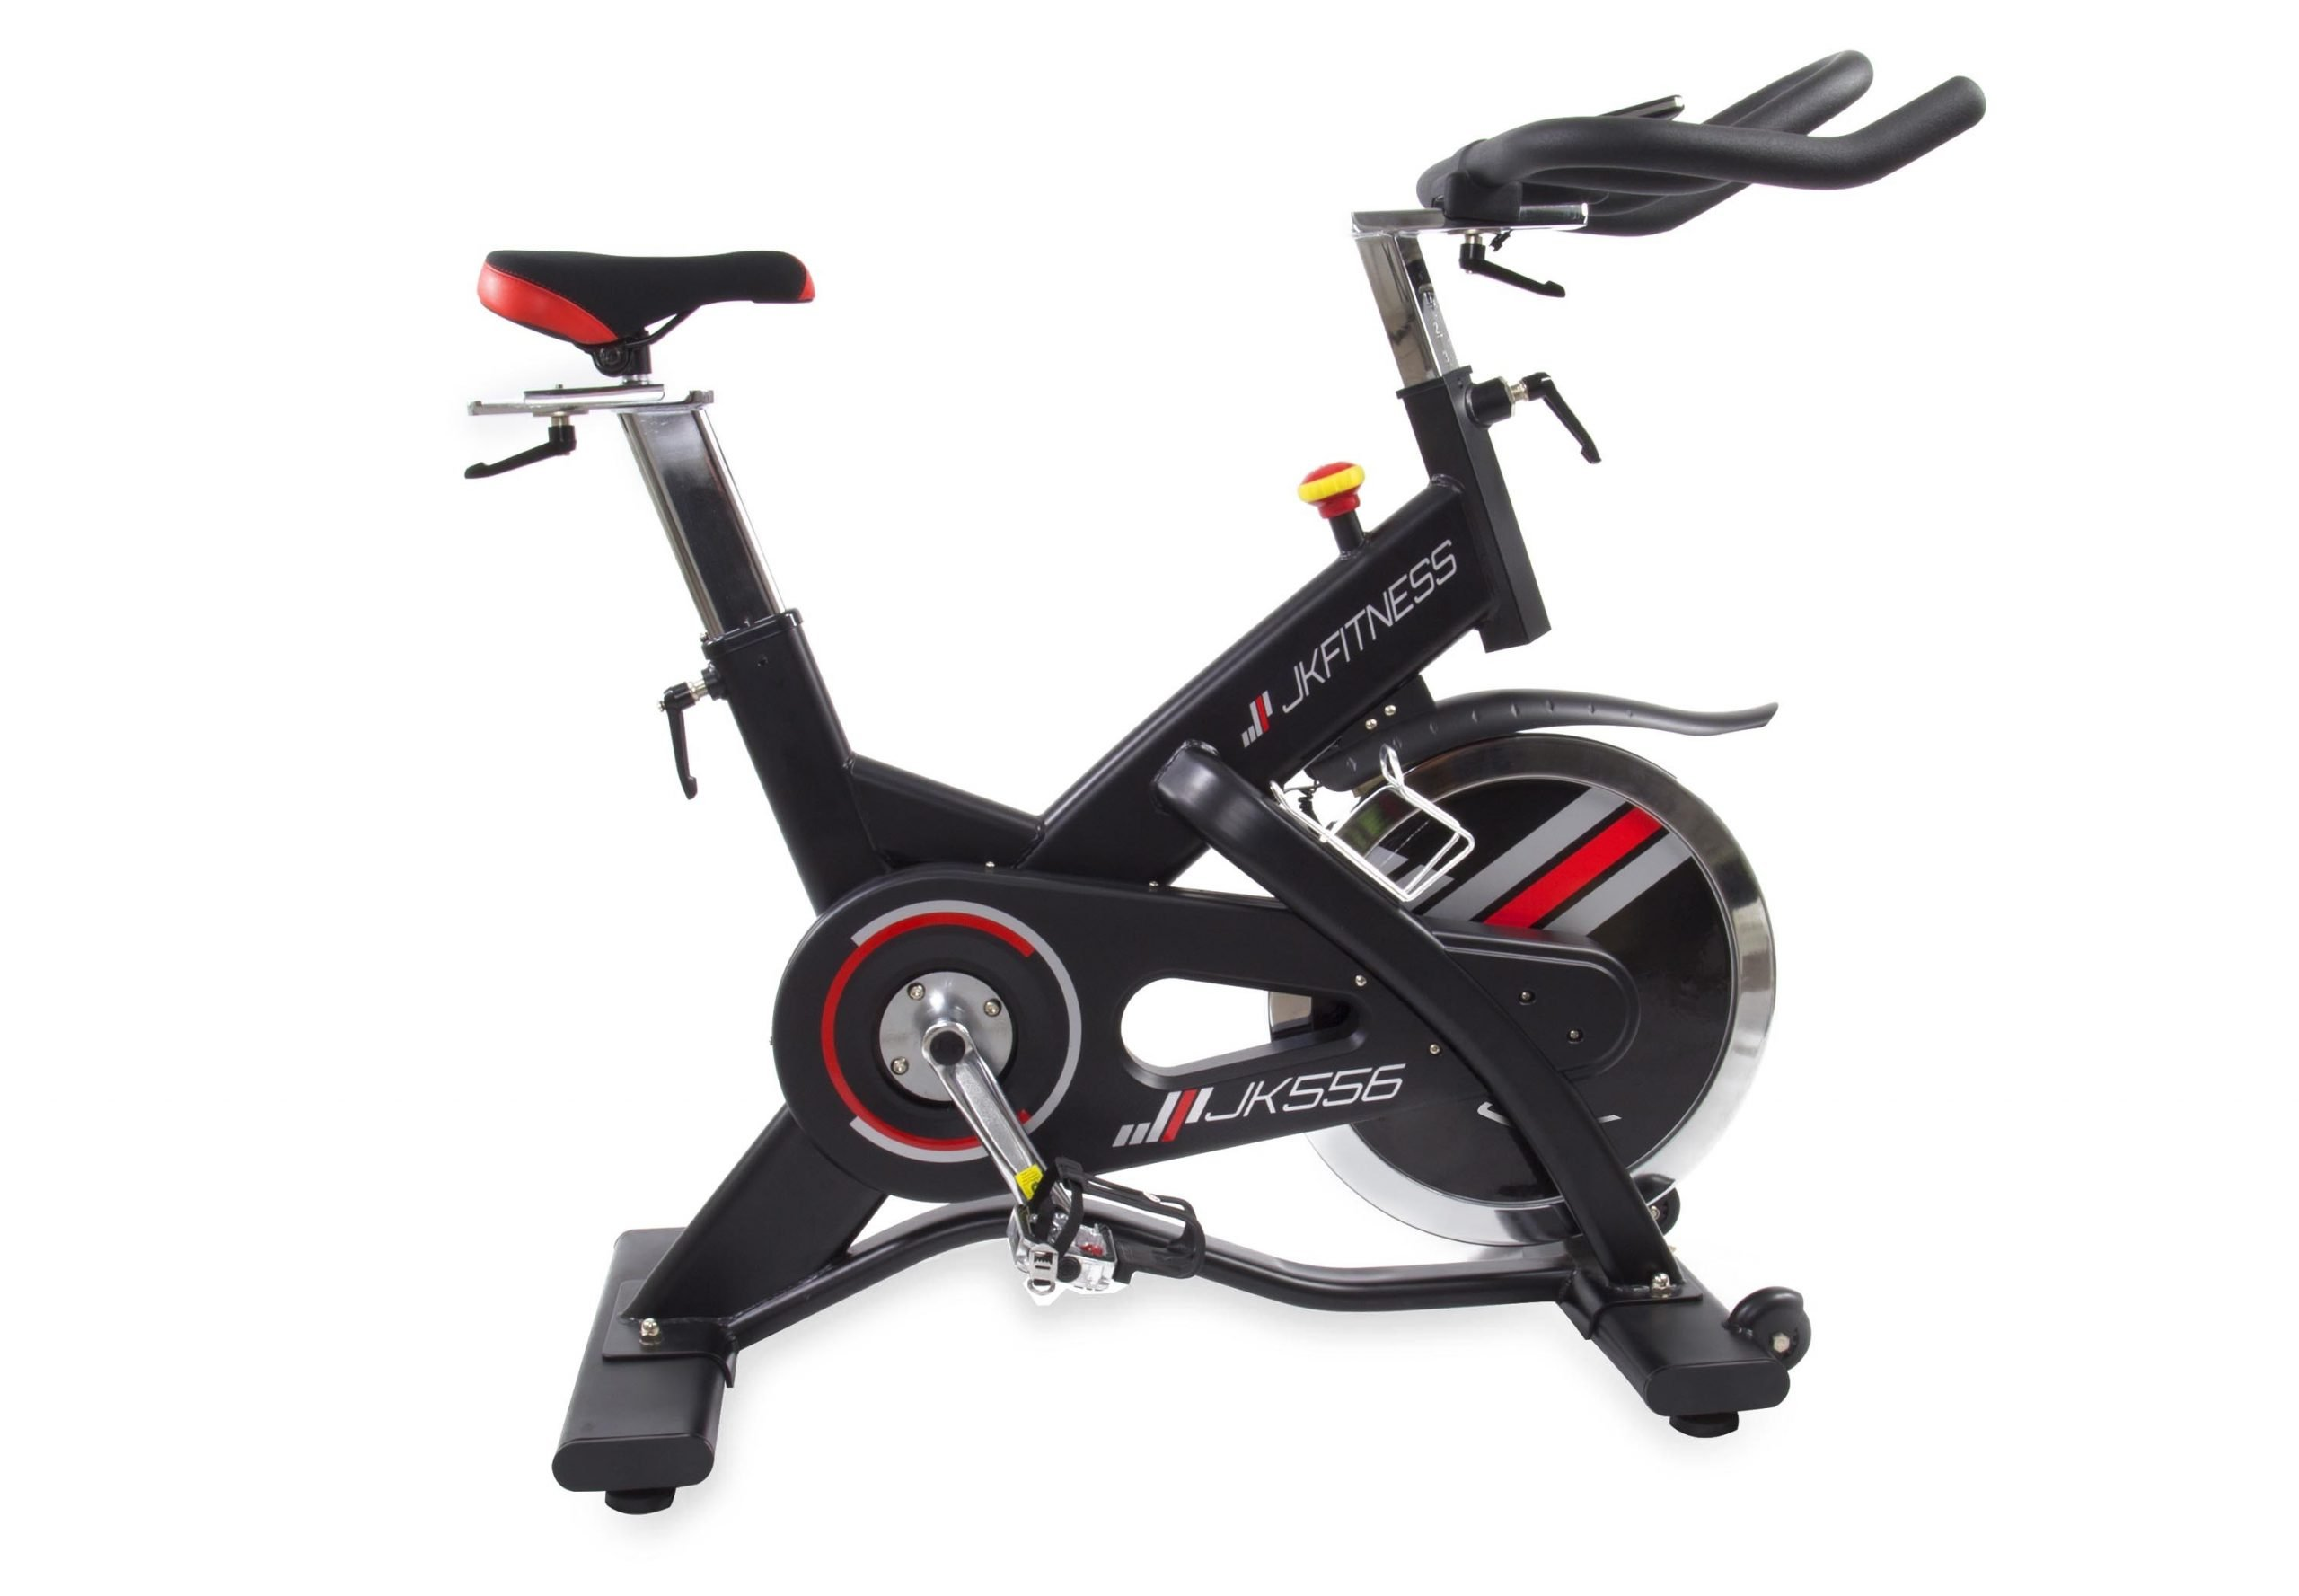 JK FITNESS - Cyclette JK 556